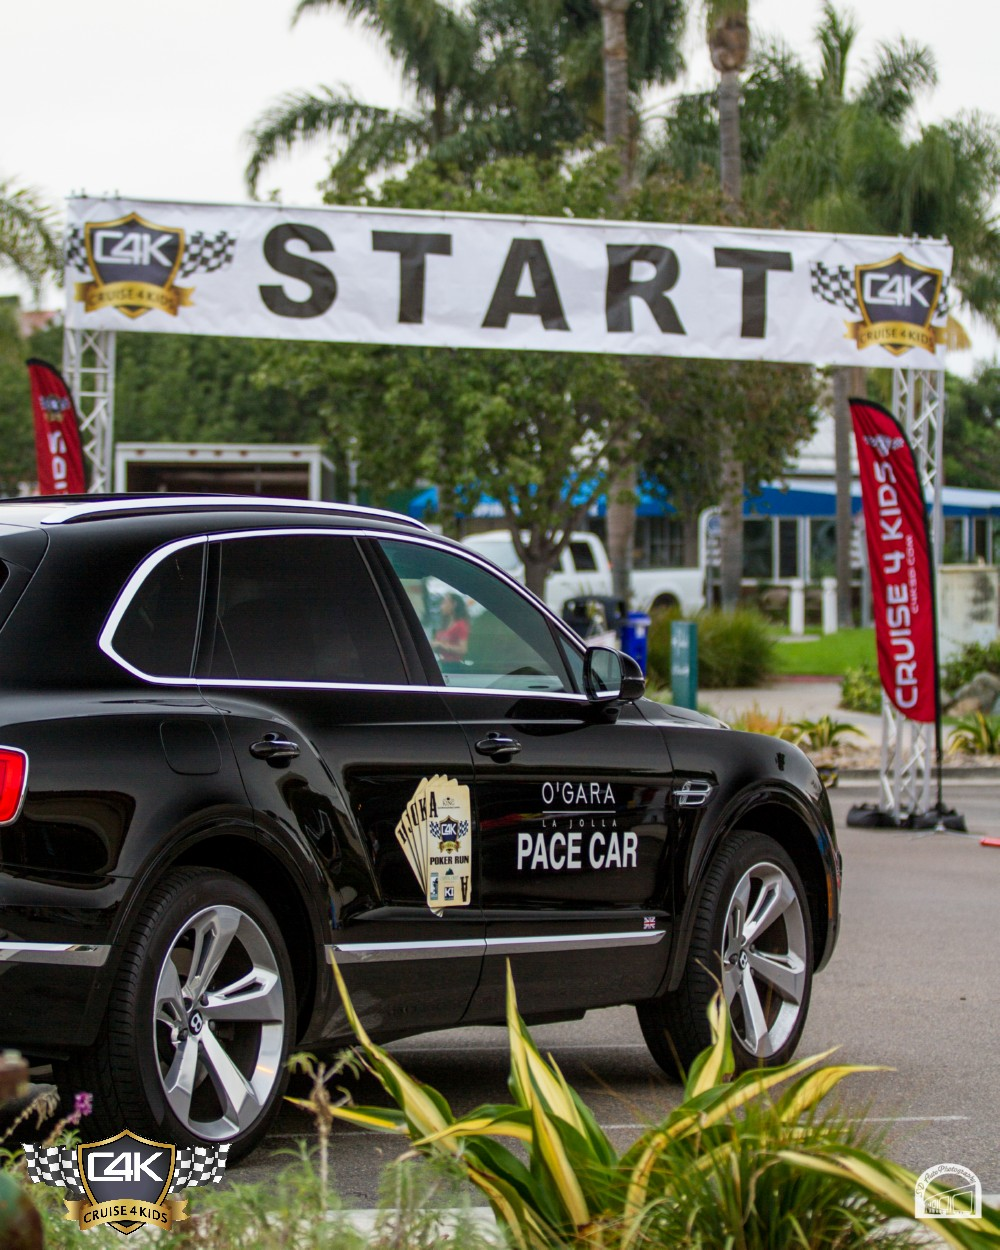 SD-Auto-Photography-2017-C4K-Rally-Poker-Run- 13.jpg